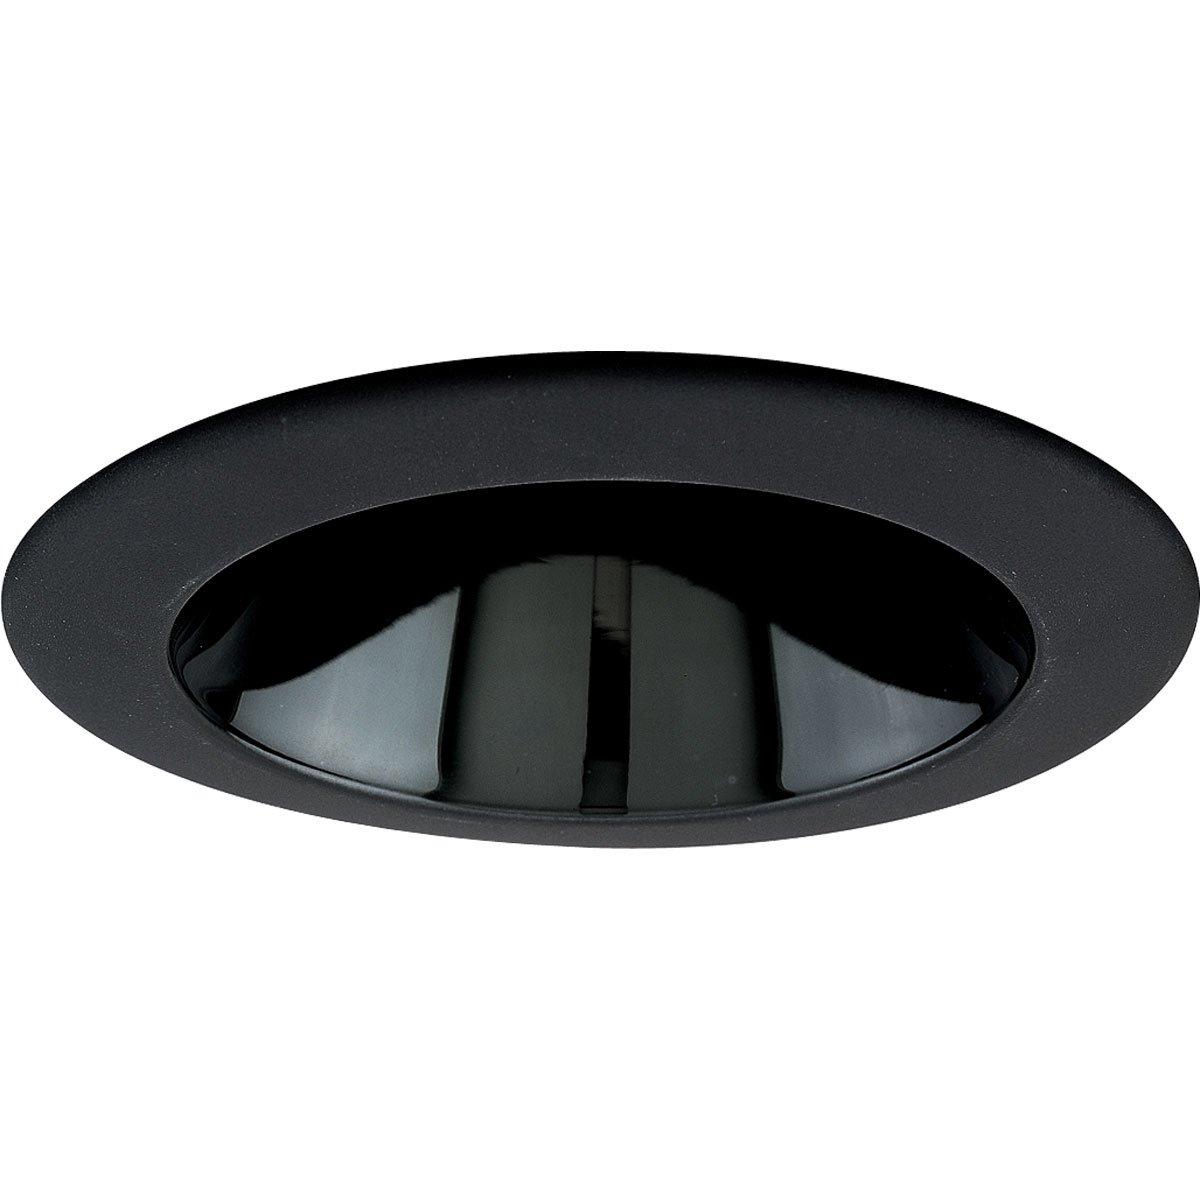 Progress Lighting P8049-31 Black Alzak Ic Trims with 360 Degree Positioning That Tilt 20 Degrees with 5-Inch Outside Diameter, Black Alzak